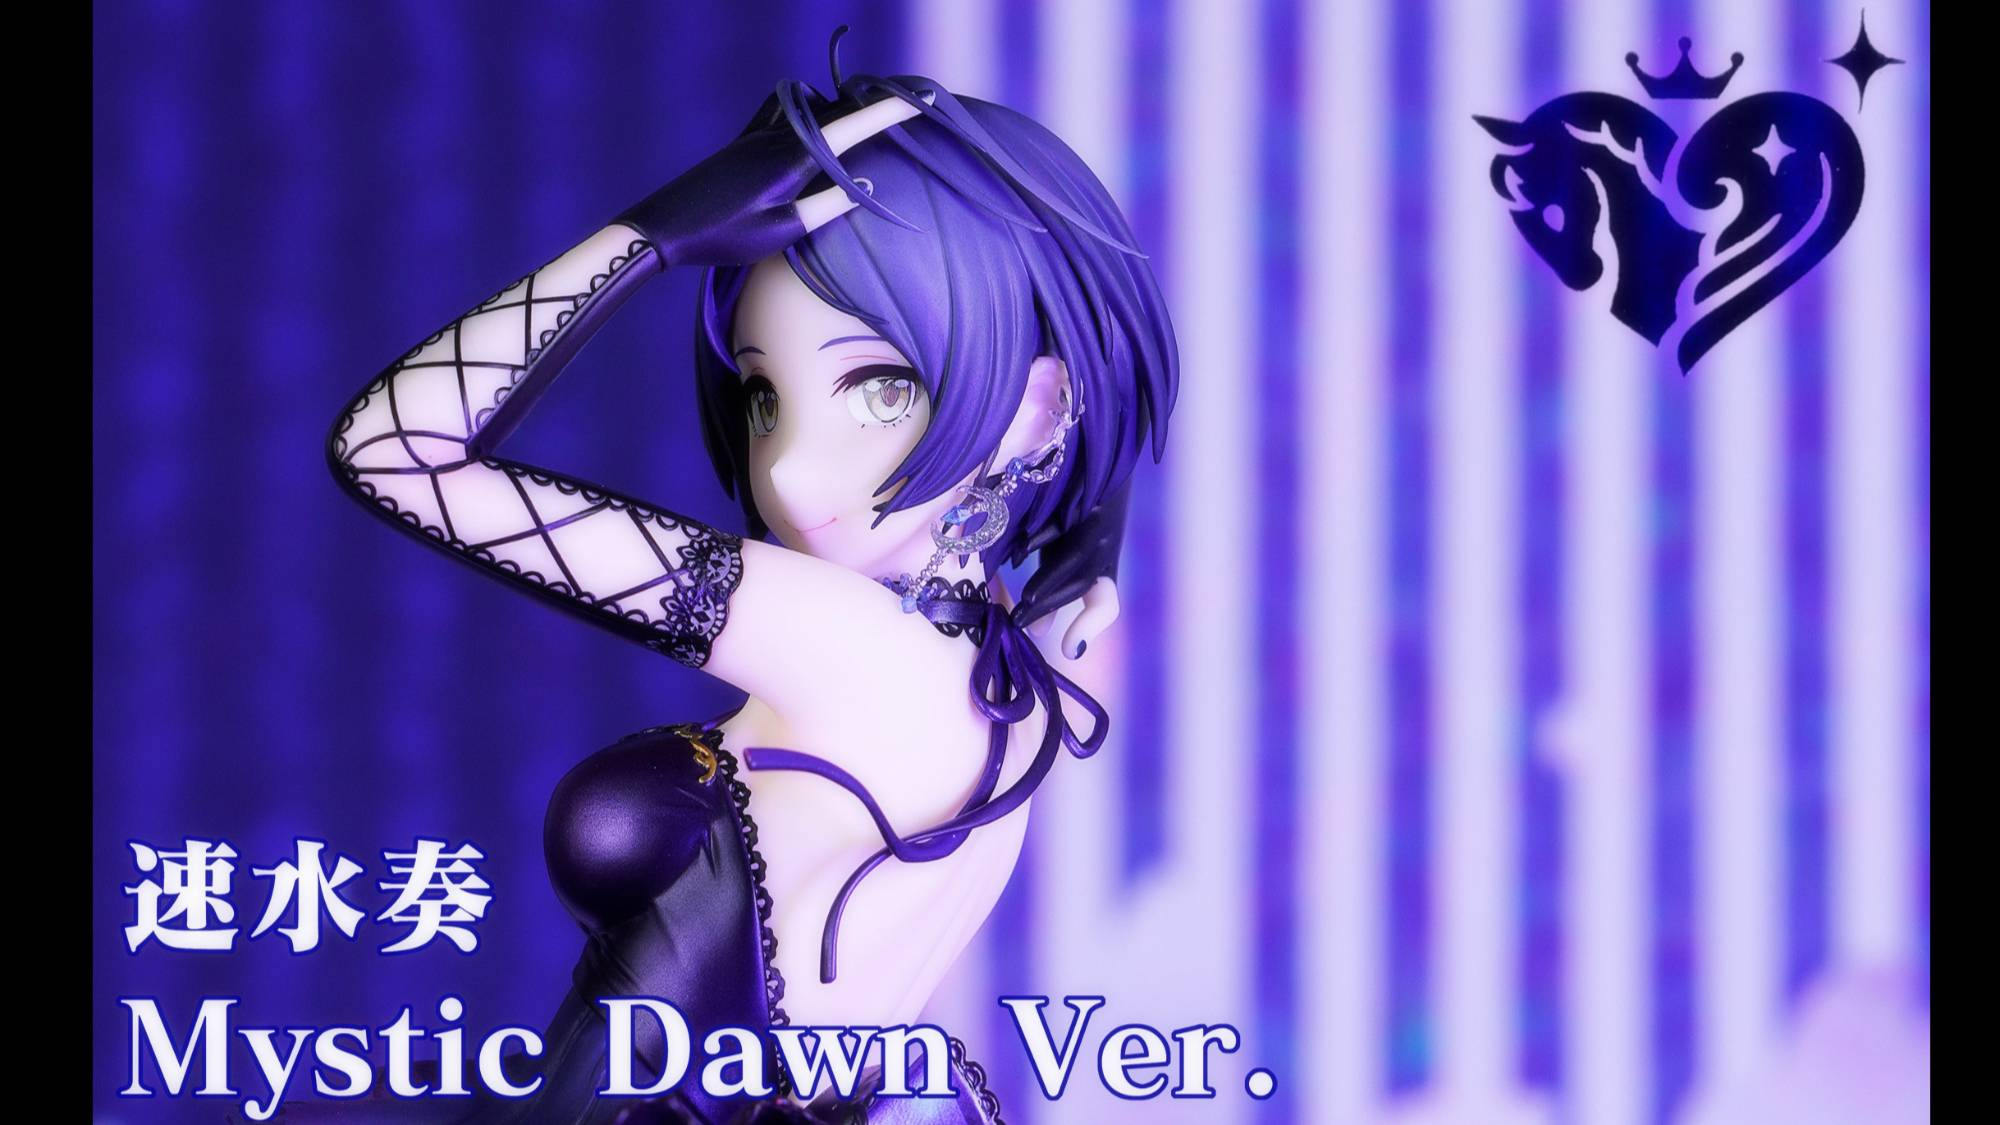 Alter 速水奏 Mystic Dawn Ver. 偶像大师灰姑娘女孩